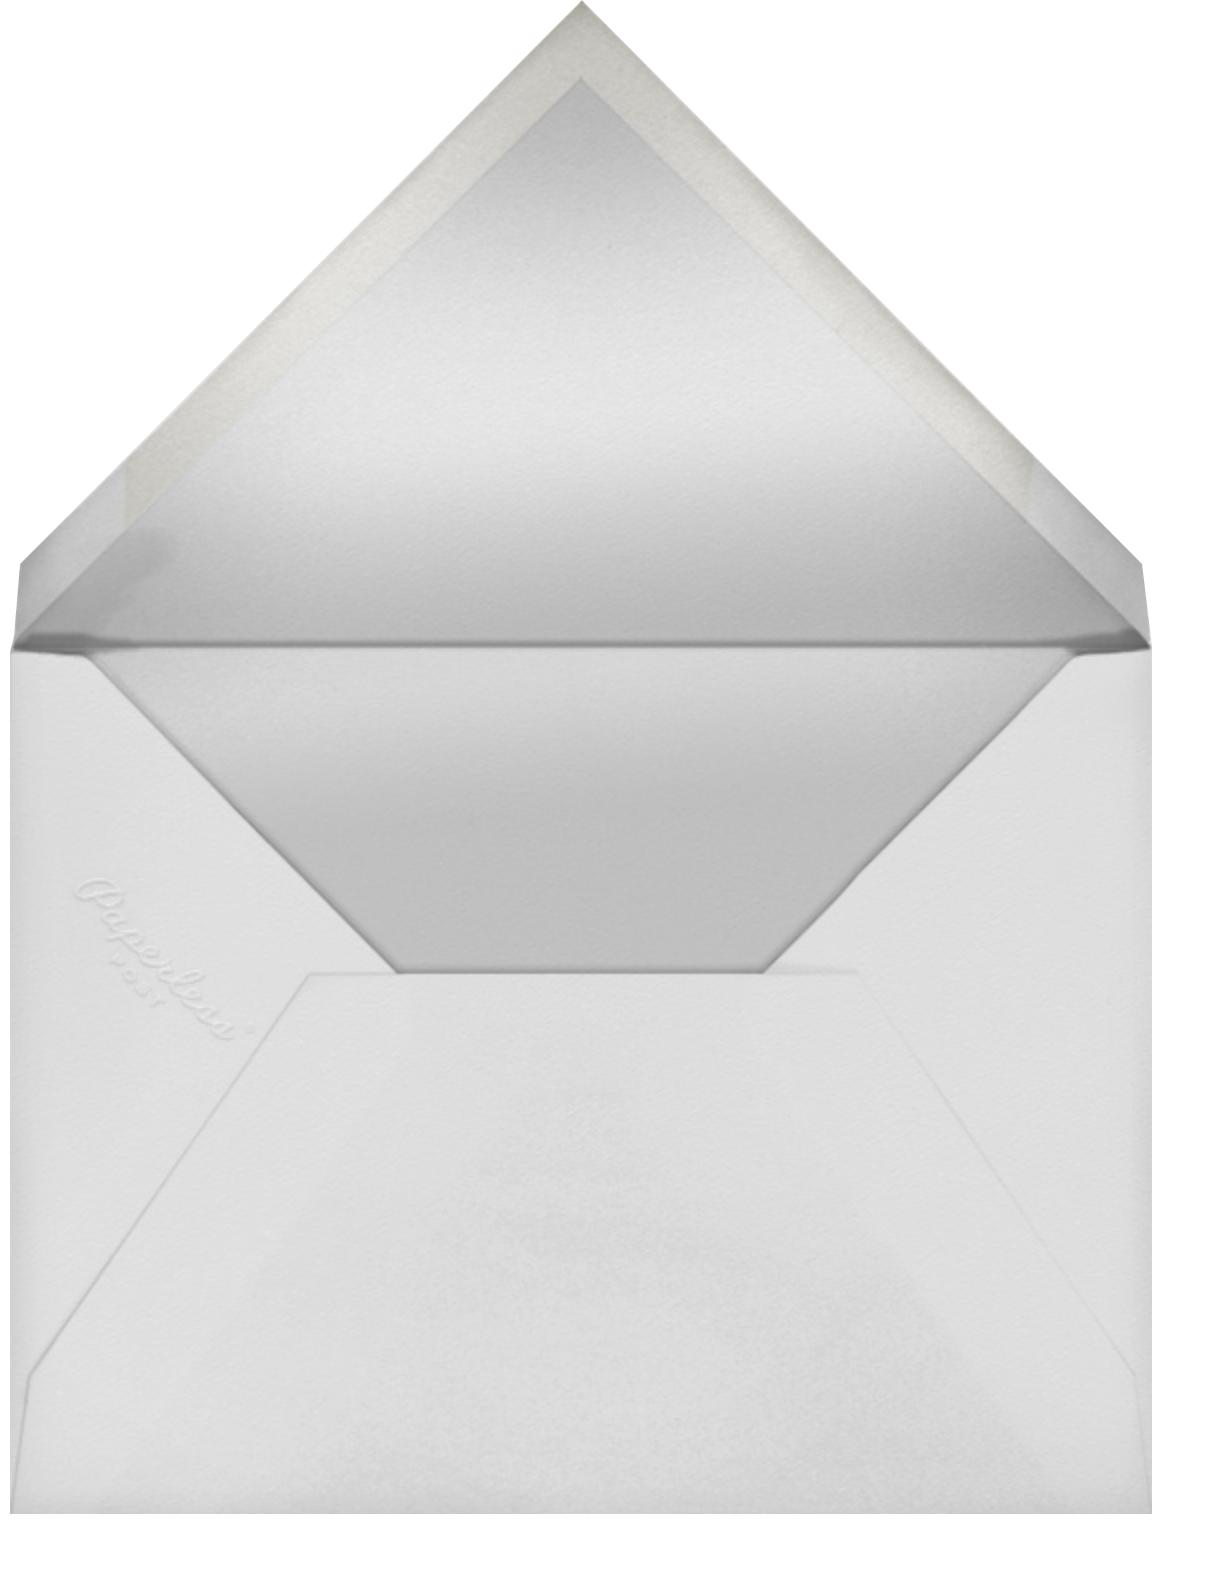 Forsythia (Menu) - Navy - Paperless Post - Envelope